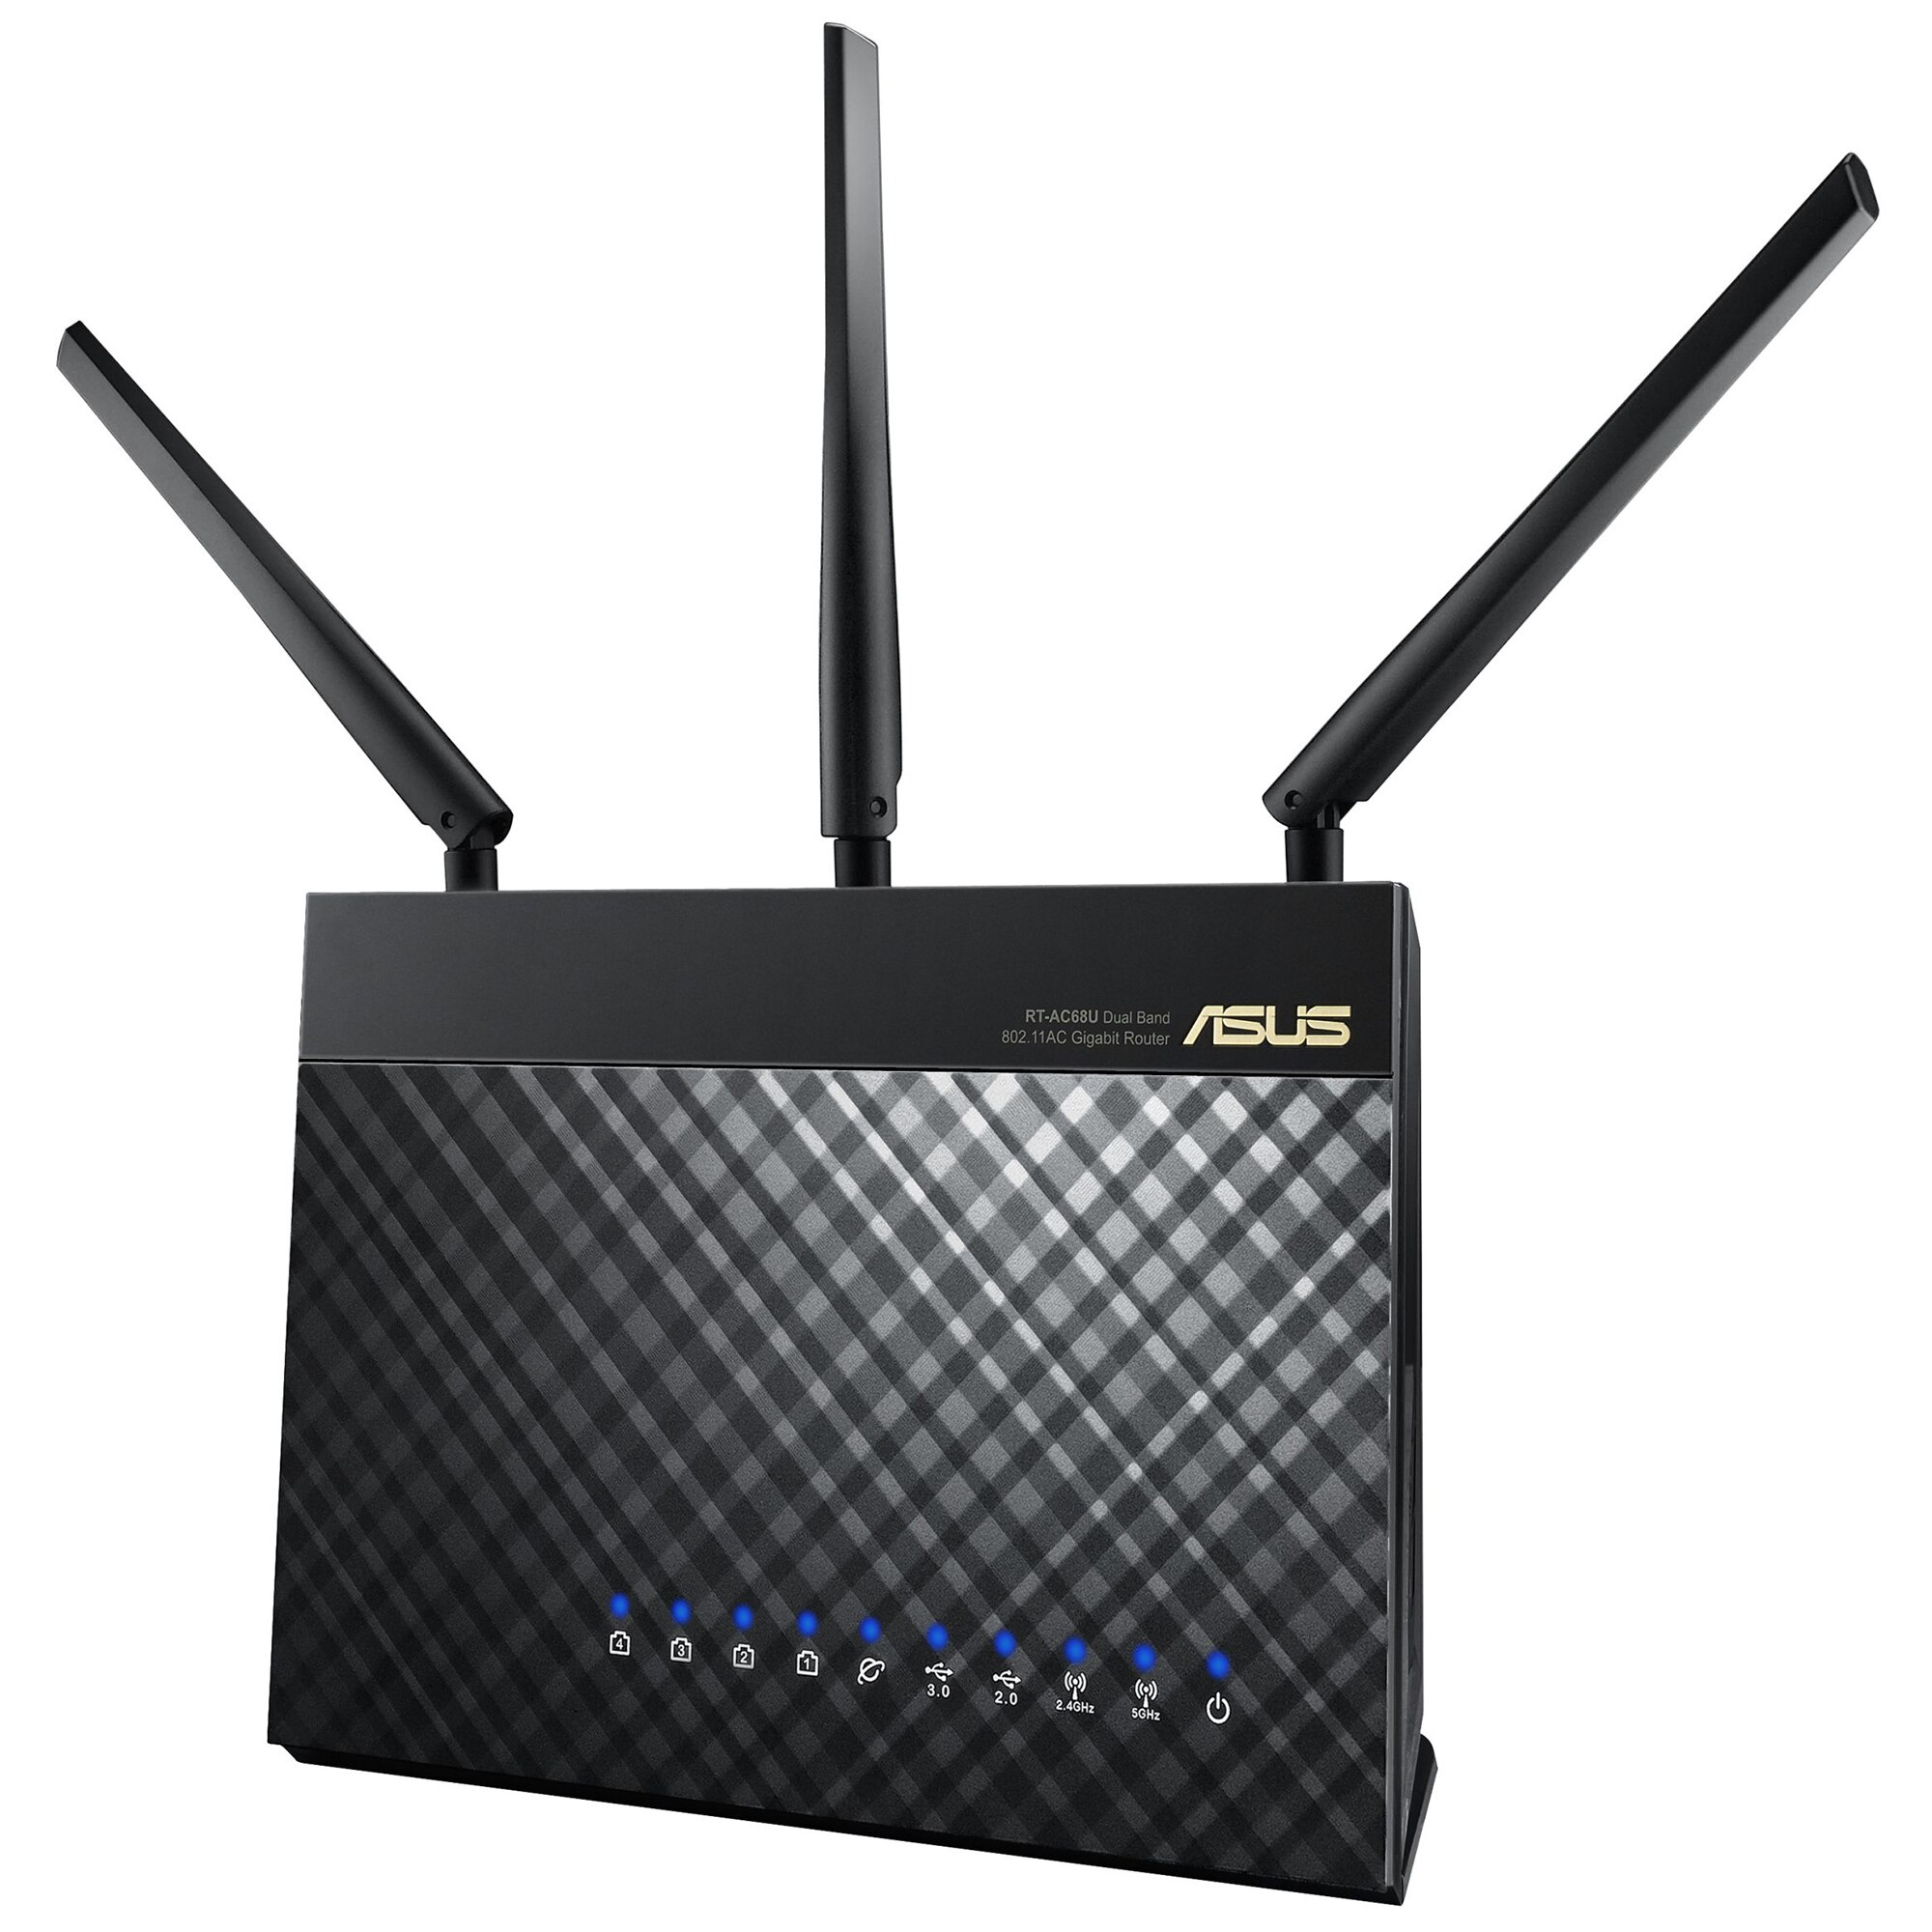 Fotografie ASUS RT-AC68U Dual-band Wireless-AC1900, AiMesh Gigabit Router, USB 3.0, IEEE 802.11a/b/g/n